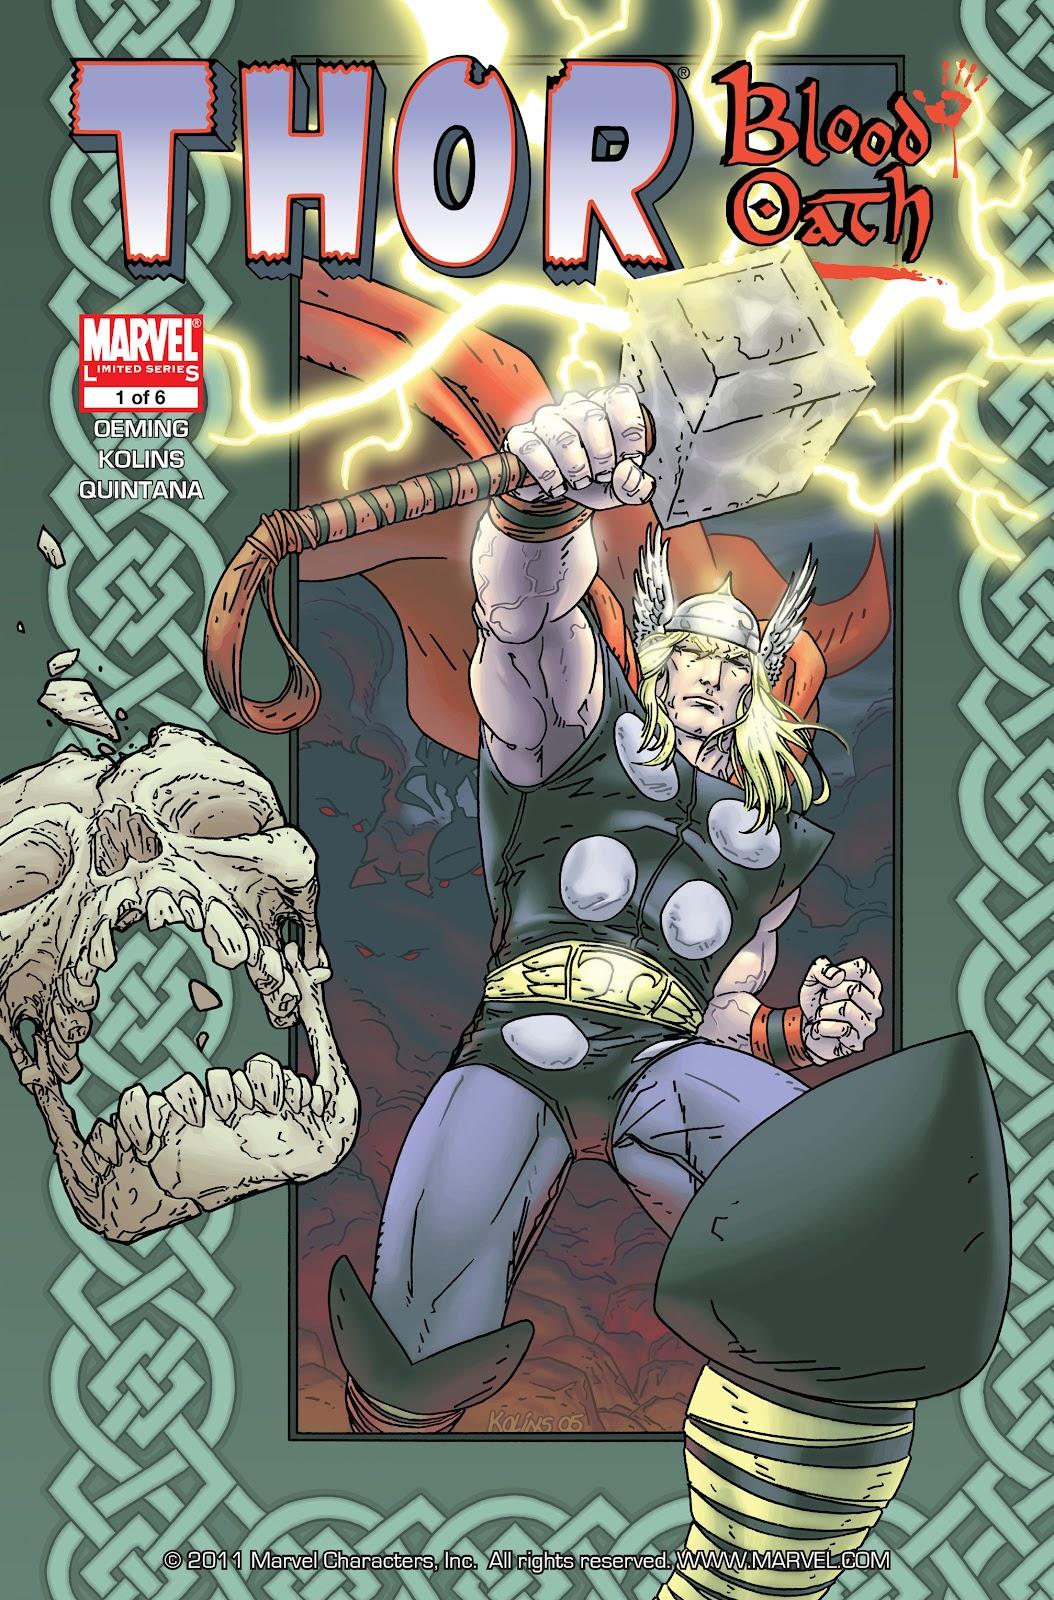 Read online Thor: Ragnaroks comic -  Issue # TPB (Part 1) - 5